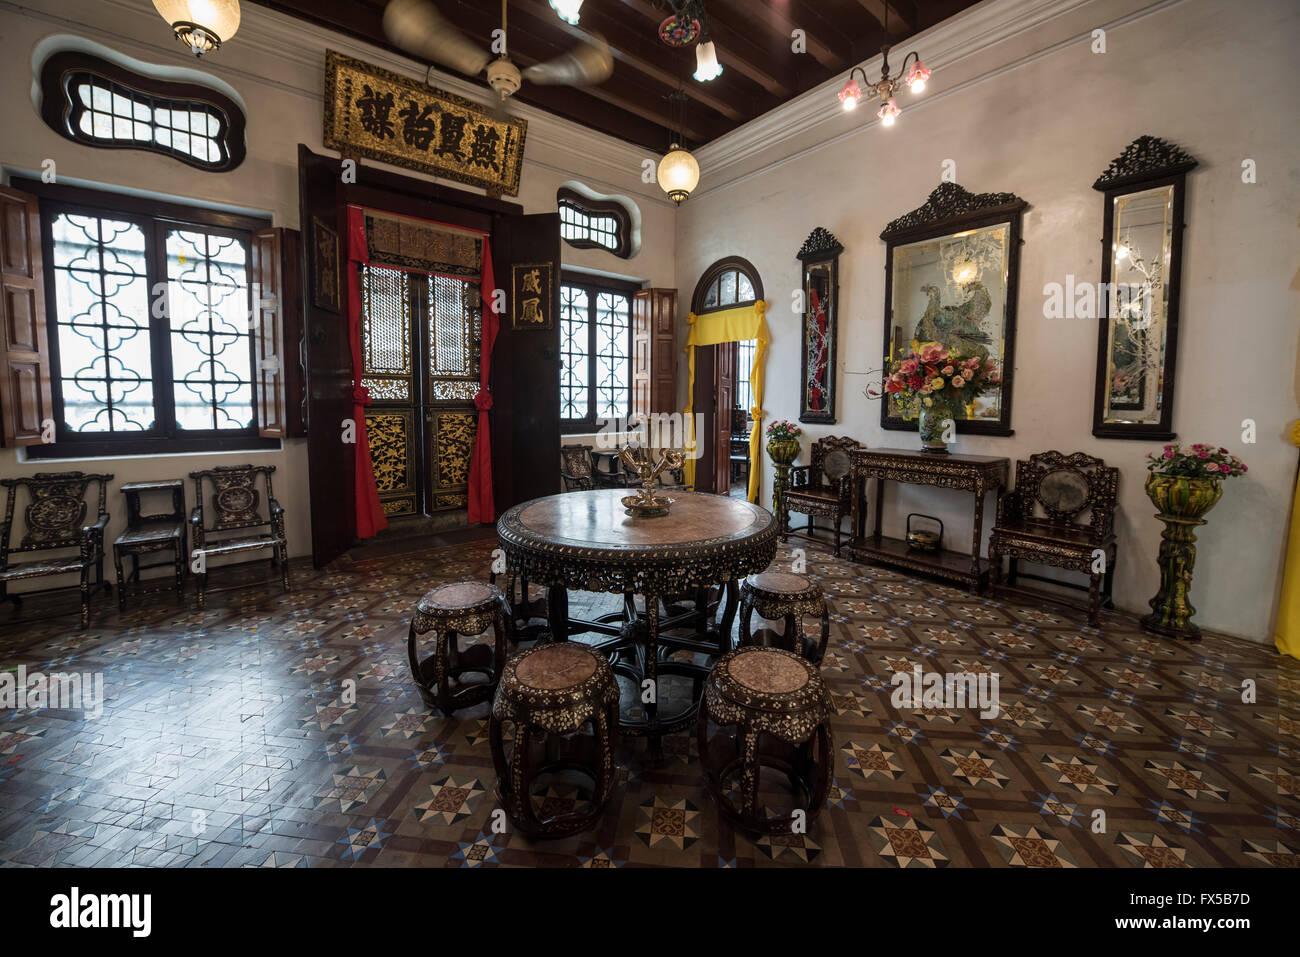 Peranakan Mansion, George Town, Penang - Stock Image